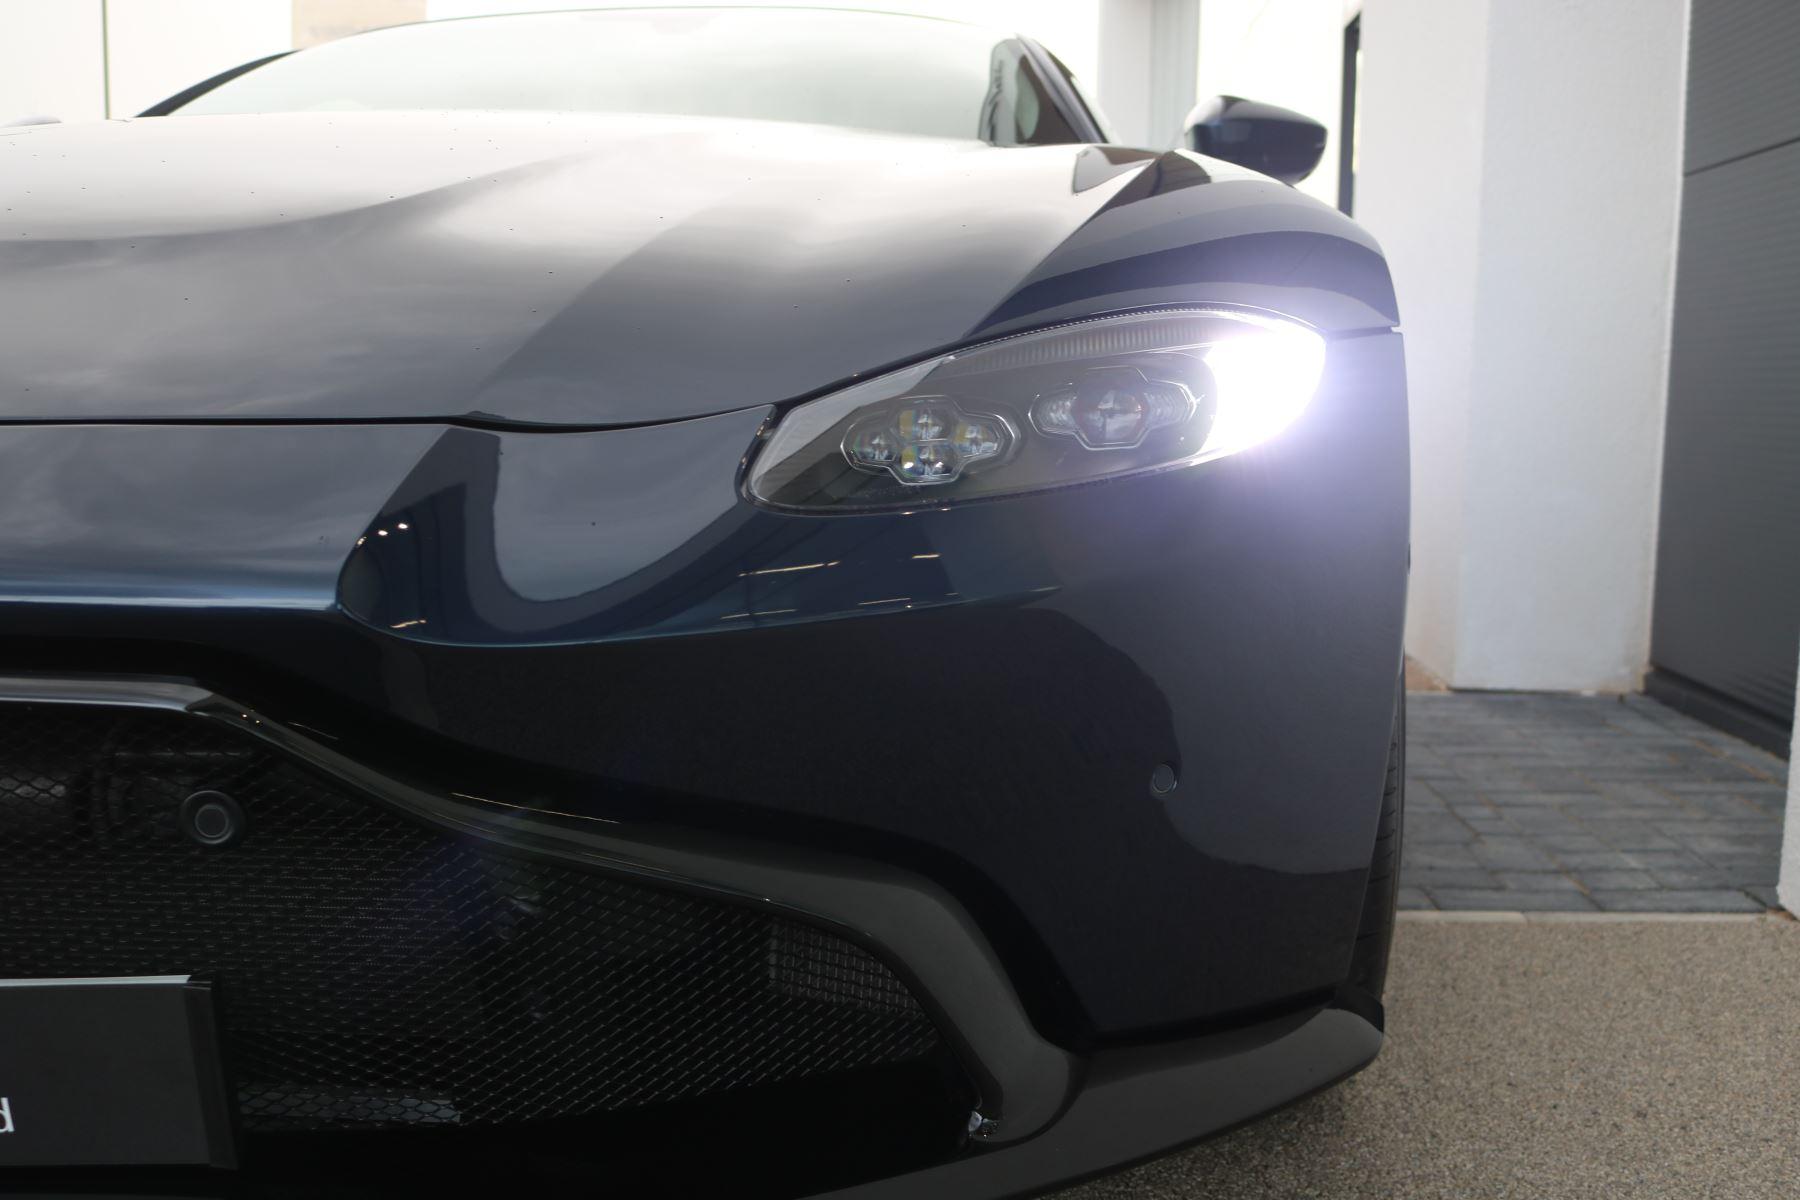 Aston Martin New Vantage 2dr ZF 8 Speed image 8